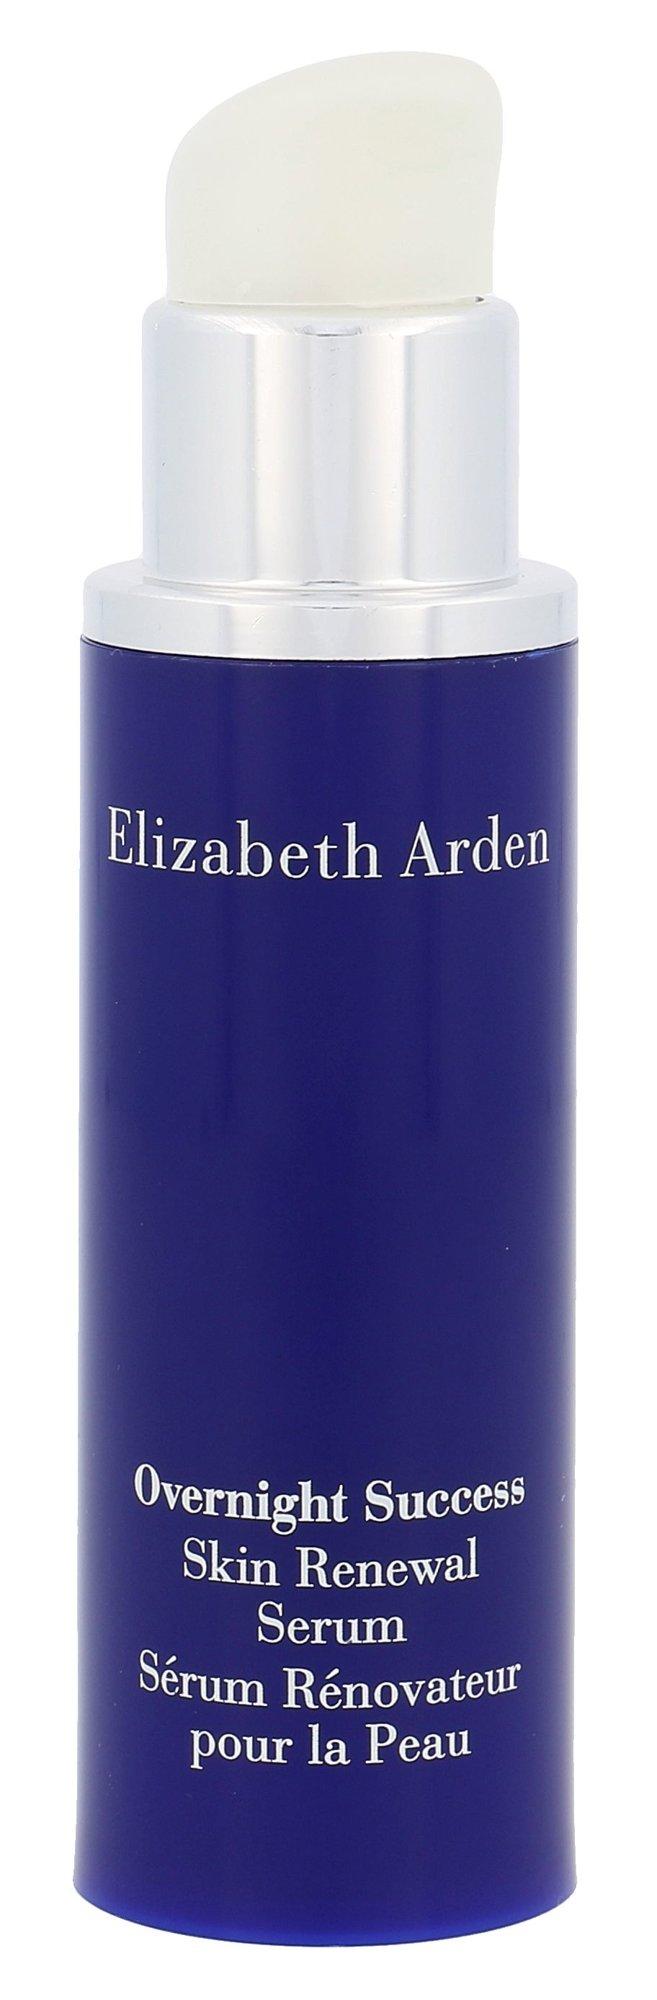 Elizabeth Arden Overnight Succes Cosmetic 30ml